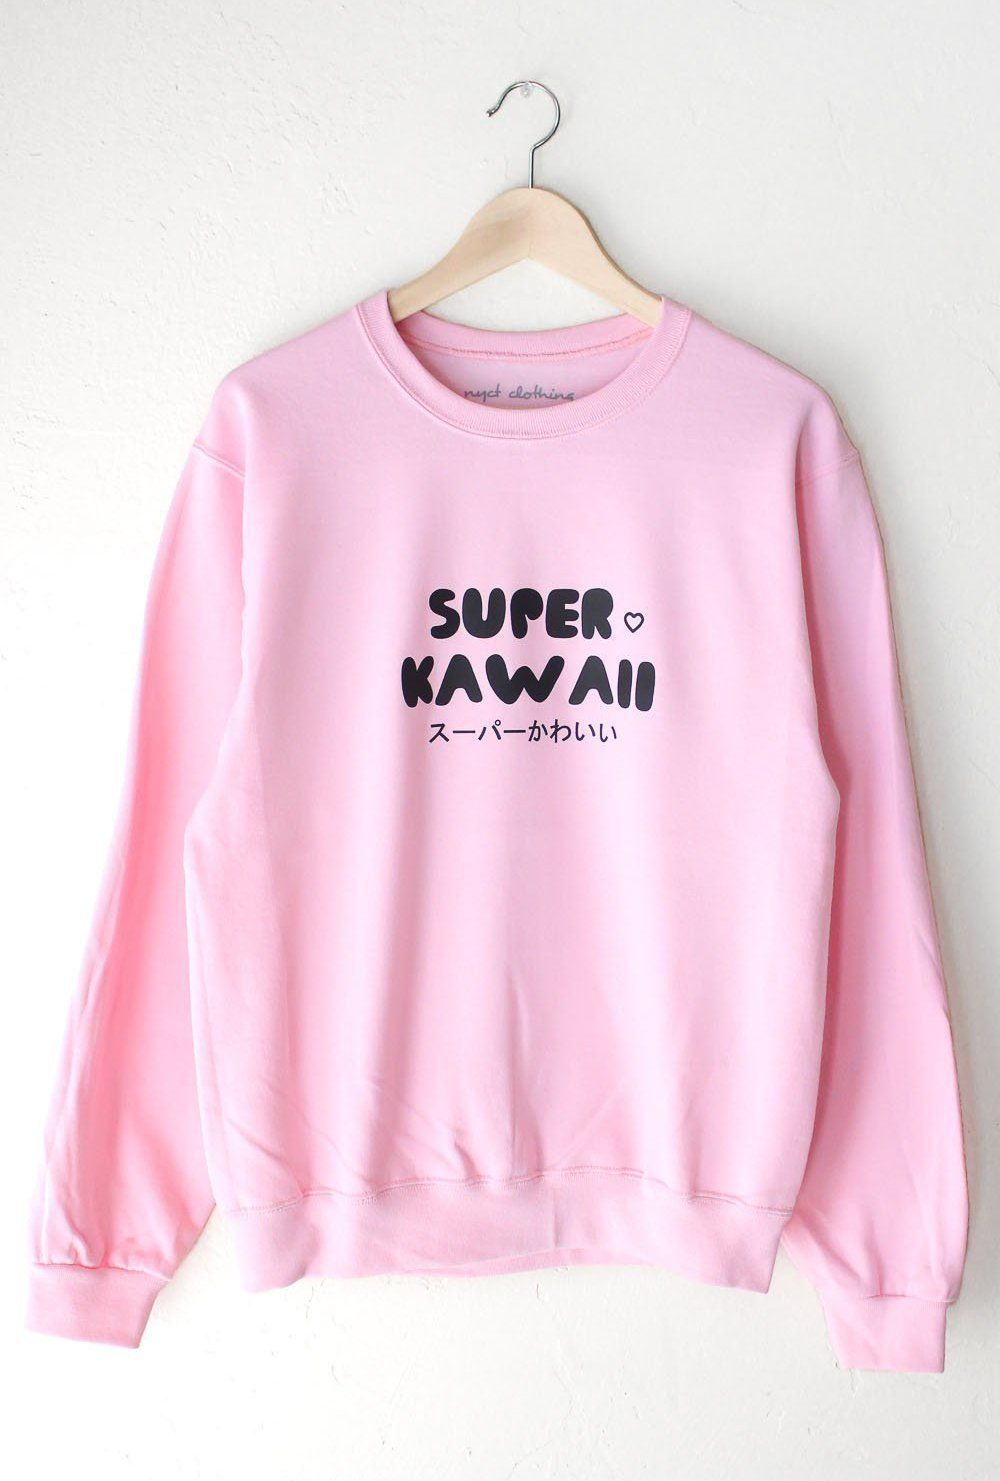 40558ef8 Description - Size Guide Details: Soft oversized sweatshirt in pink with  print 'Super